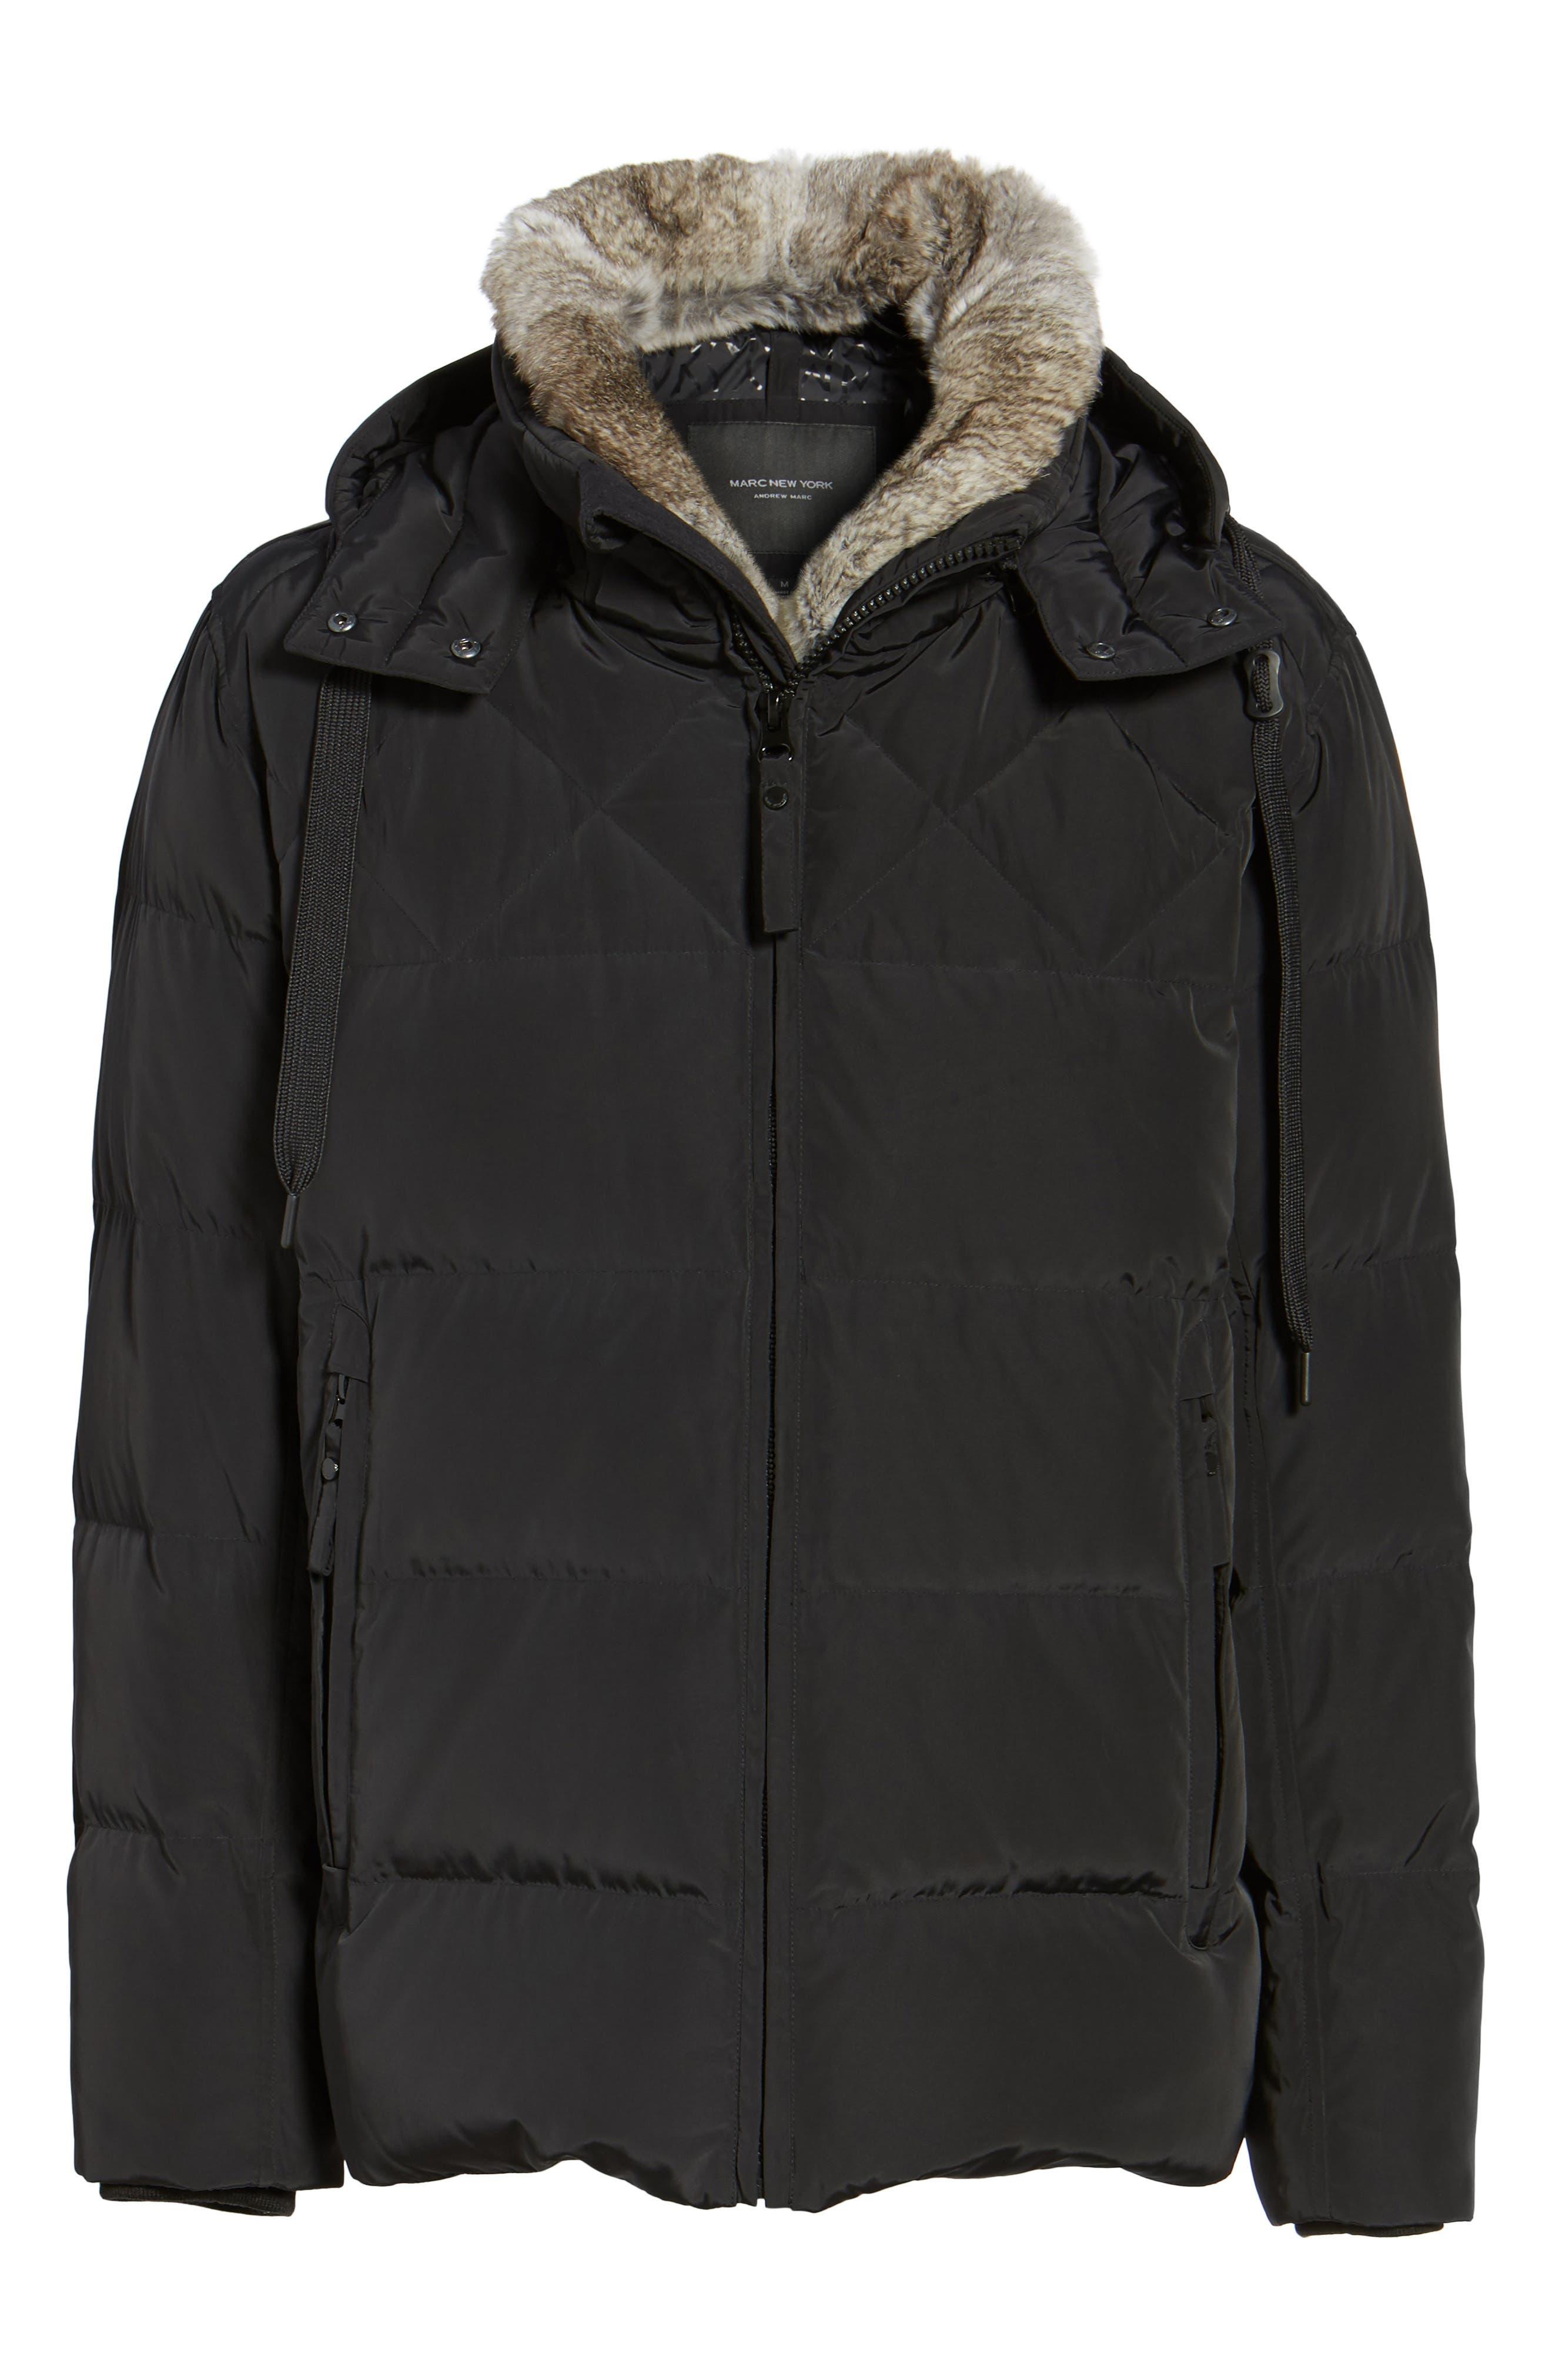 Navan Quilted Down Jacket with Genuine Rabbit Fur Trim,                             Alternate thumbnail 5, color,                             001